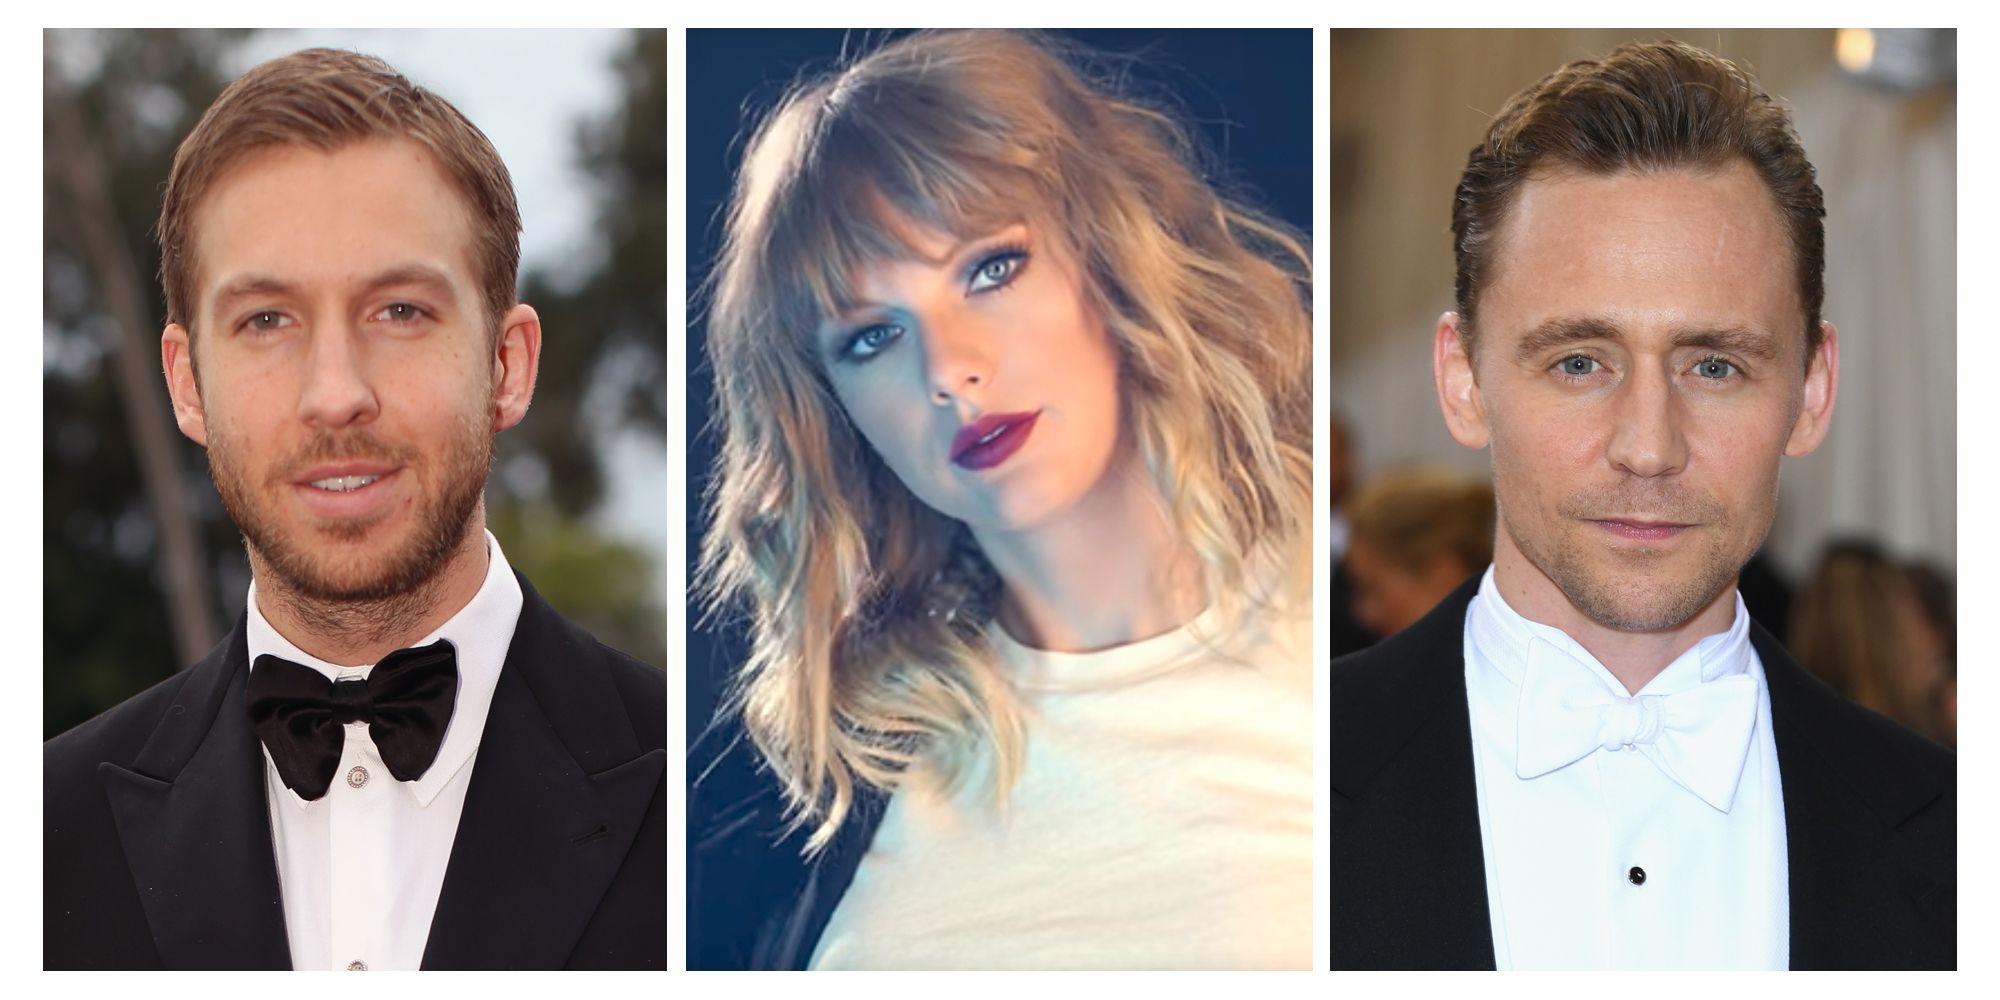 Calvin Harris, Taylor Swift, and Tom Hiddleston